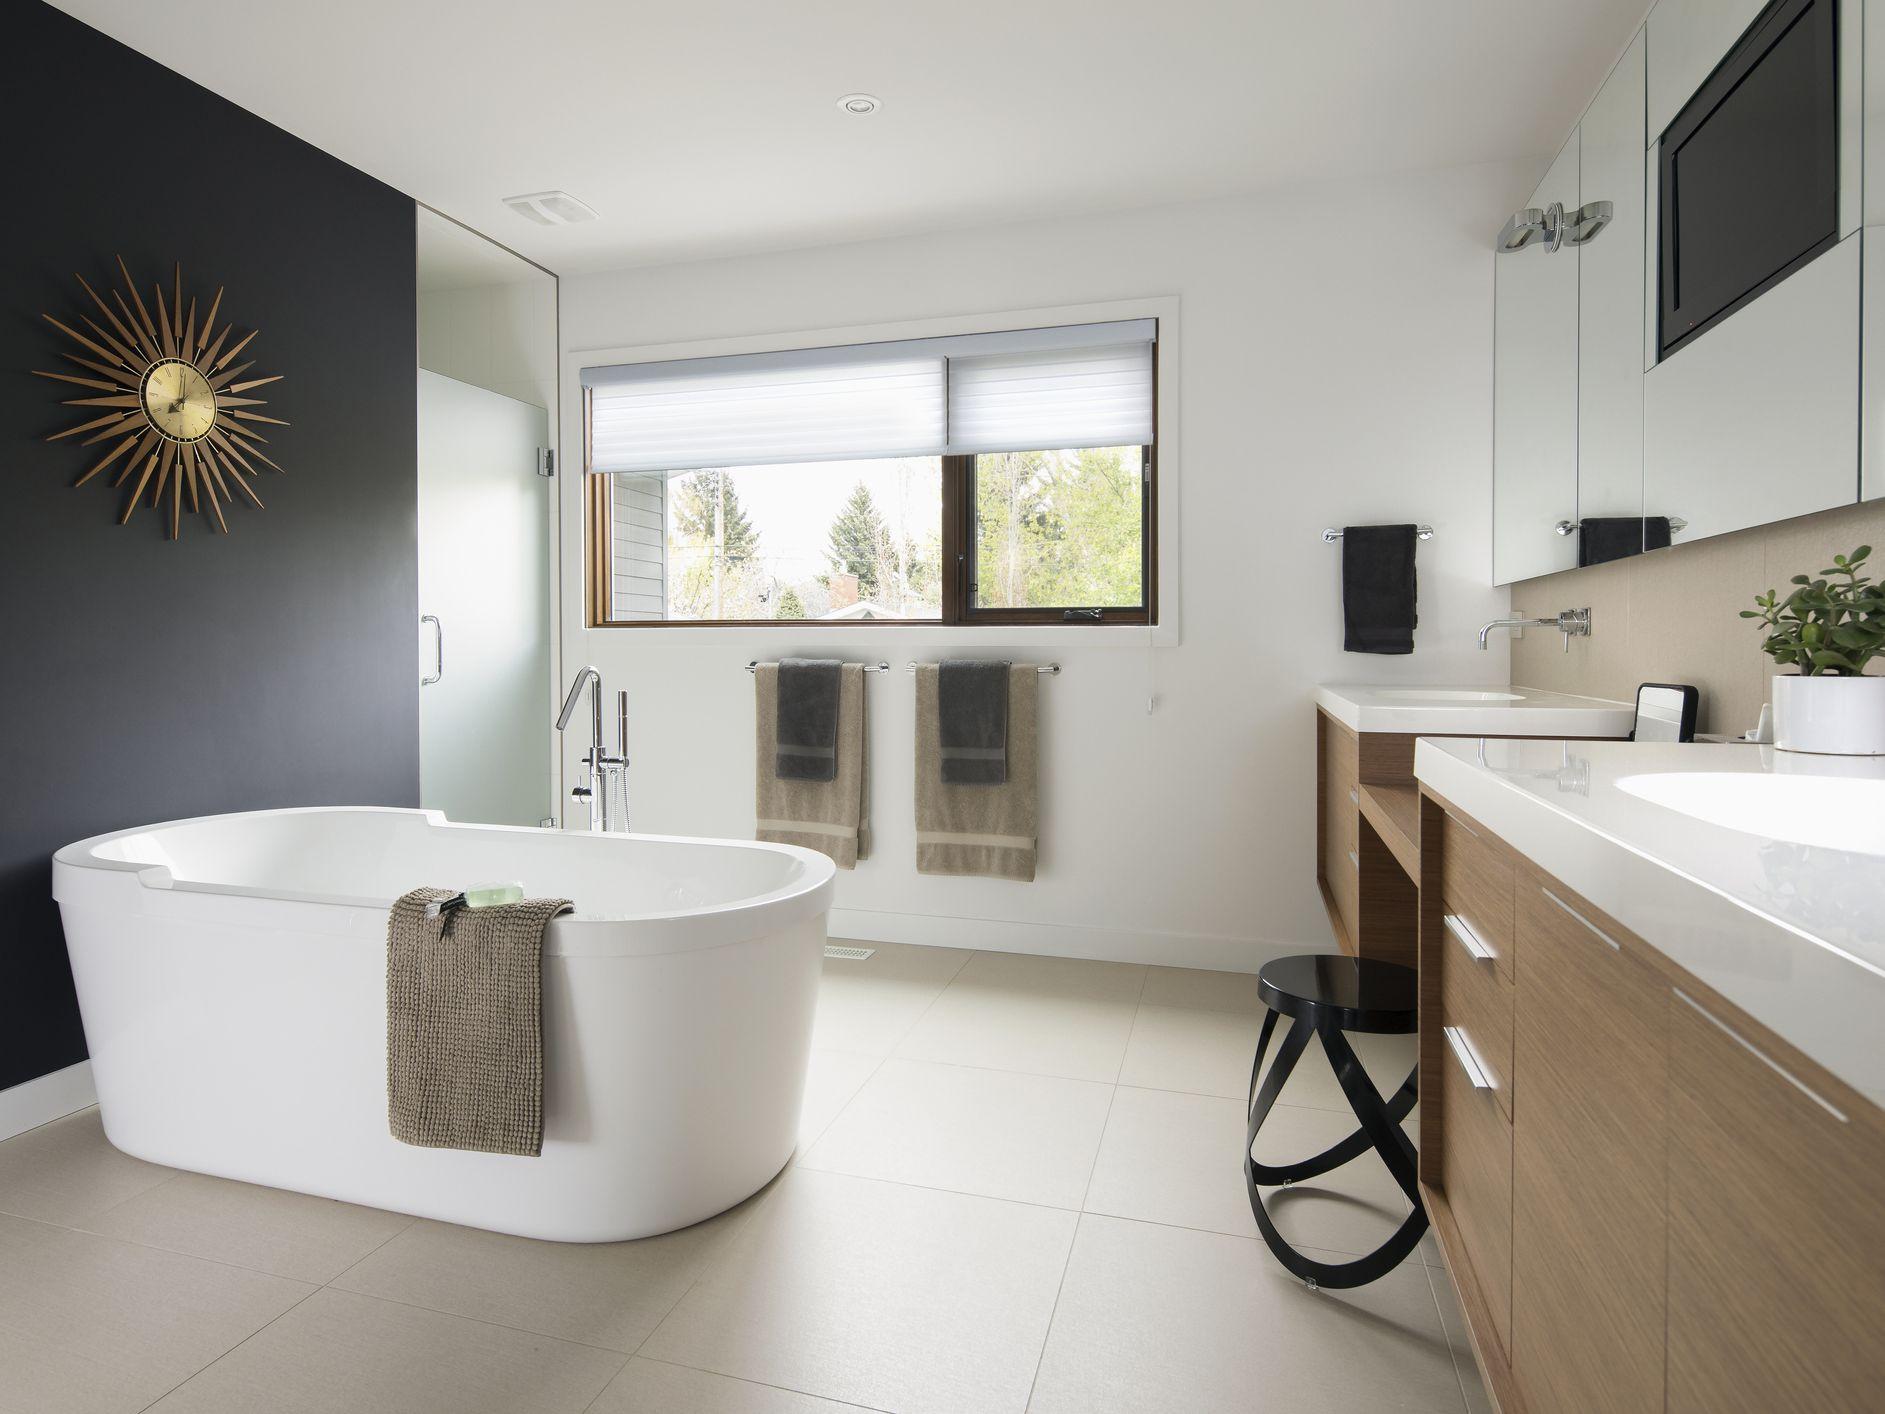 10 Ideas for Modern-Style Bathrooms